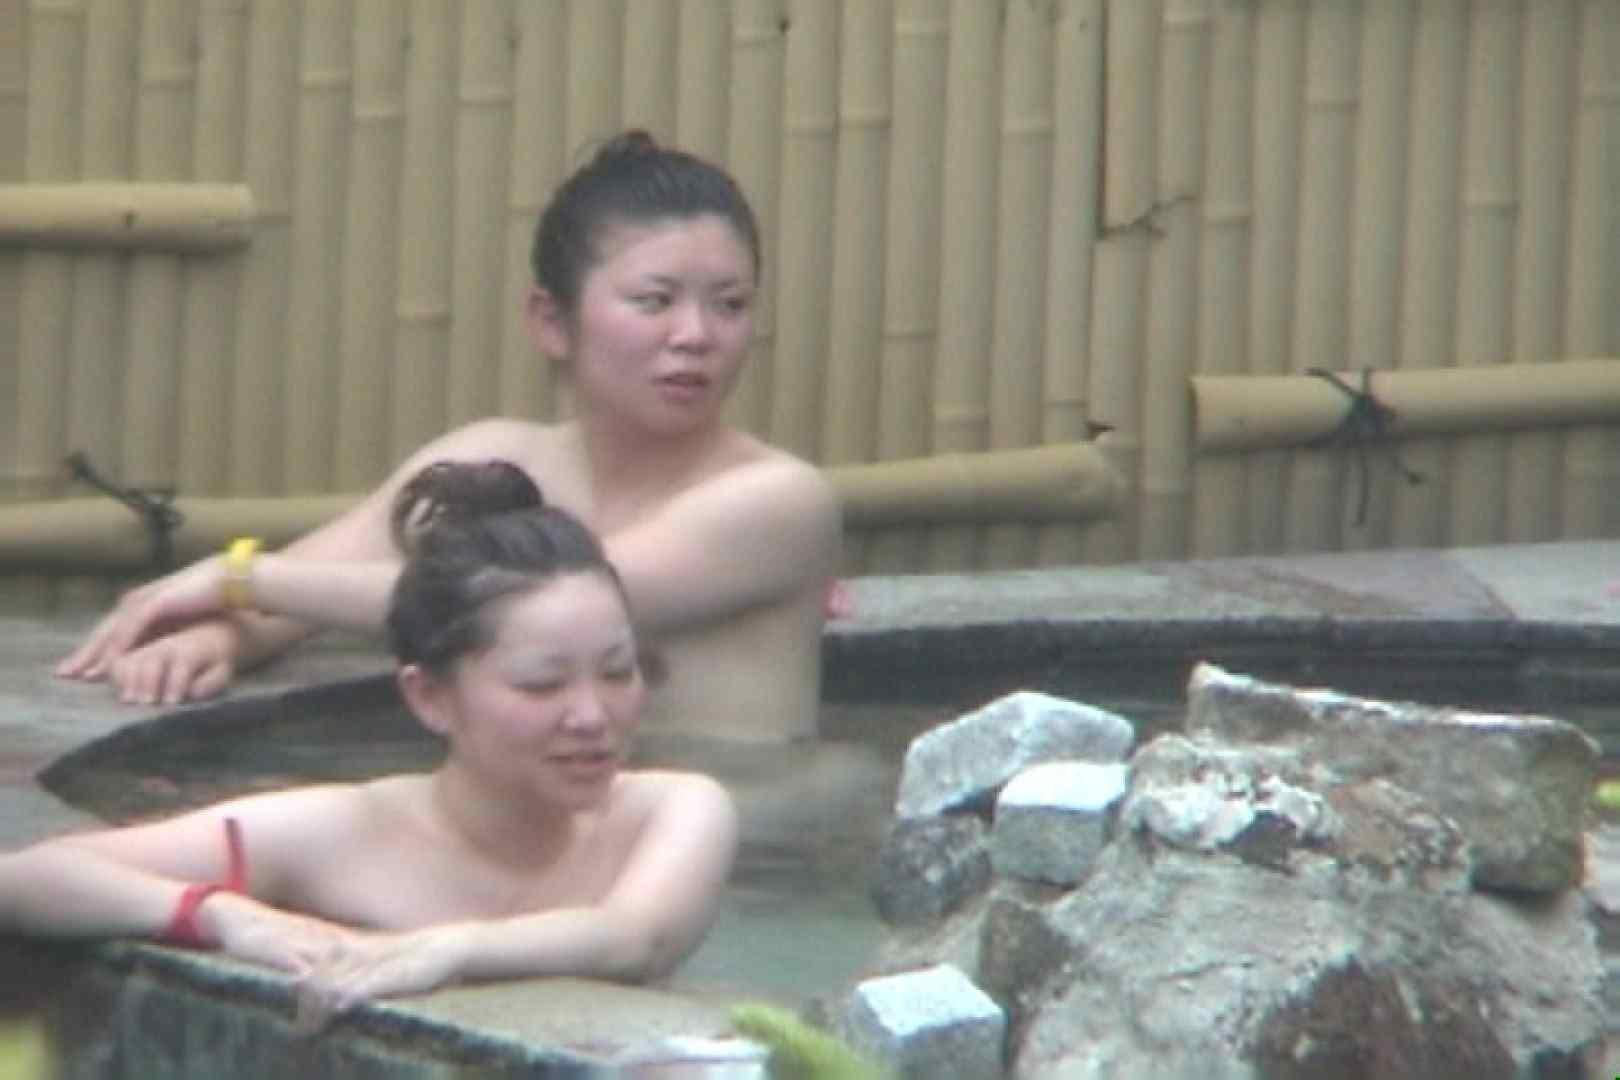 Aquaな露天風呂Vol.47【VIP限定】 露天風呂突入 オマンコ無修正動画無料 94pic 77